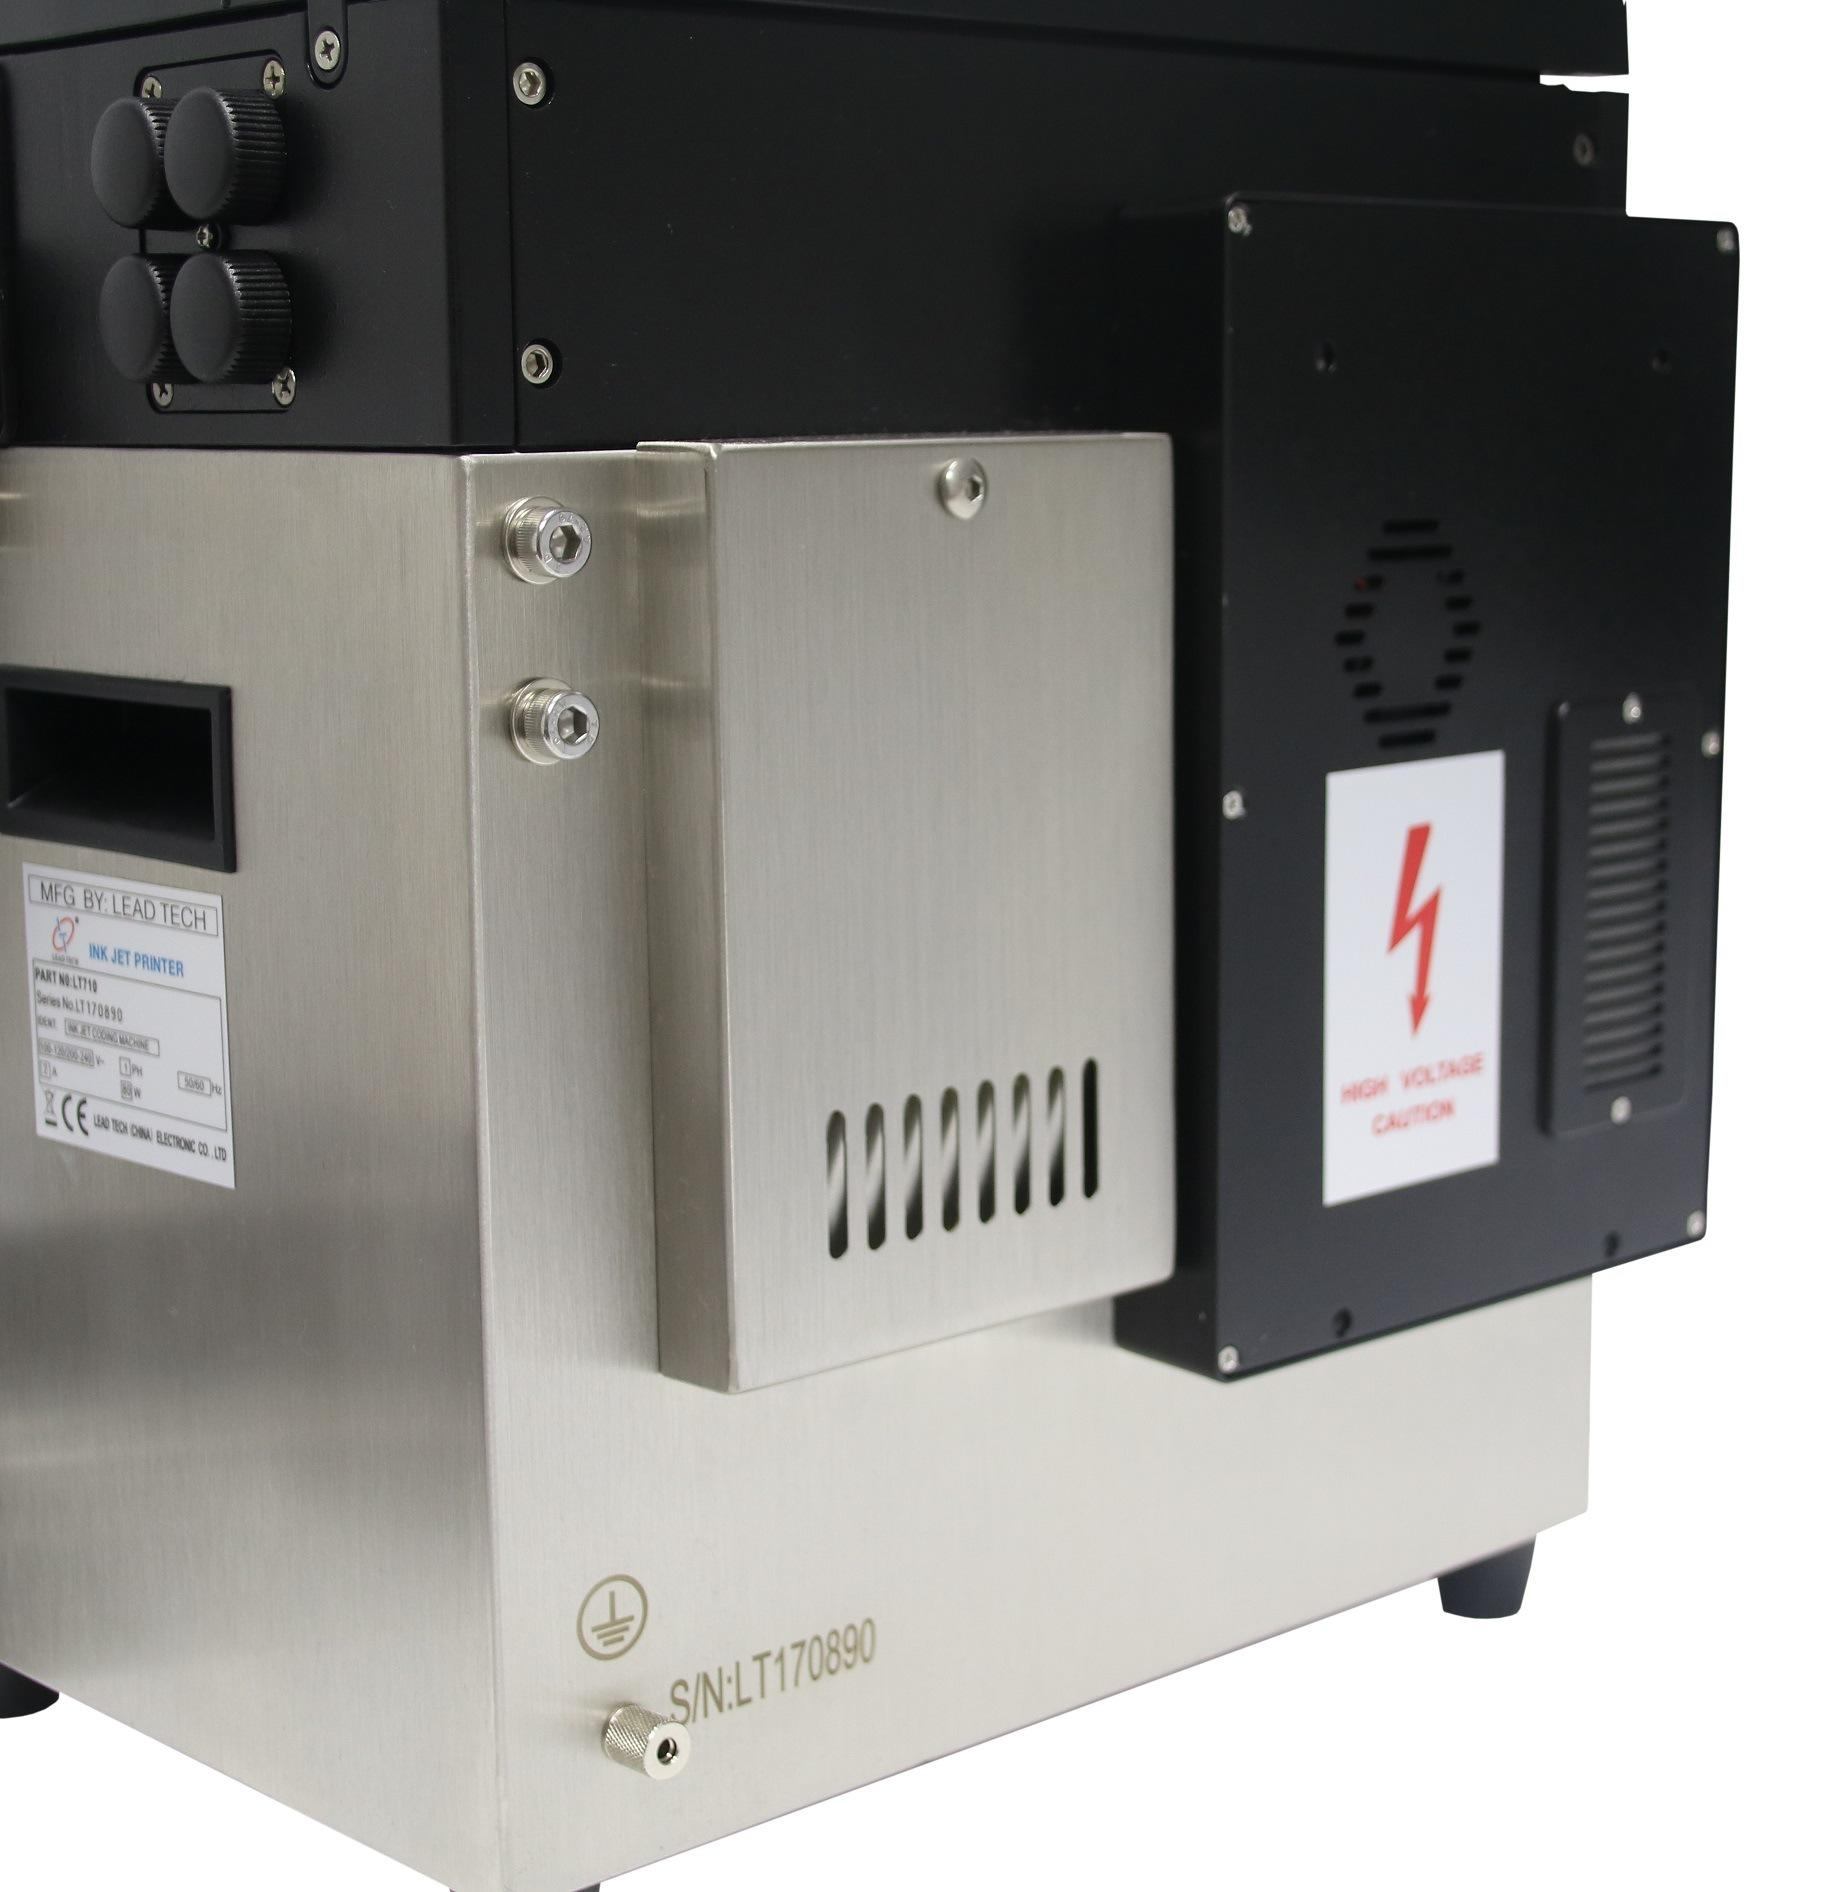 Lead Tech Tuna Can Coding Continuous Cij Inkjet Printer Lt760